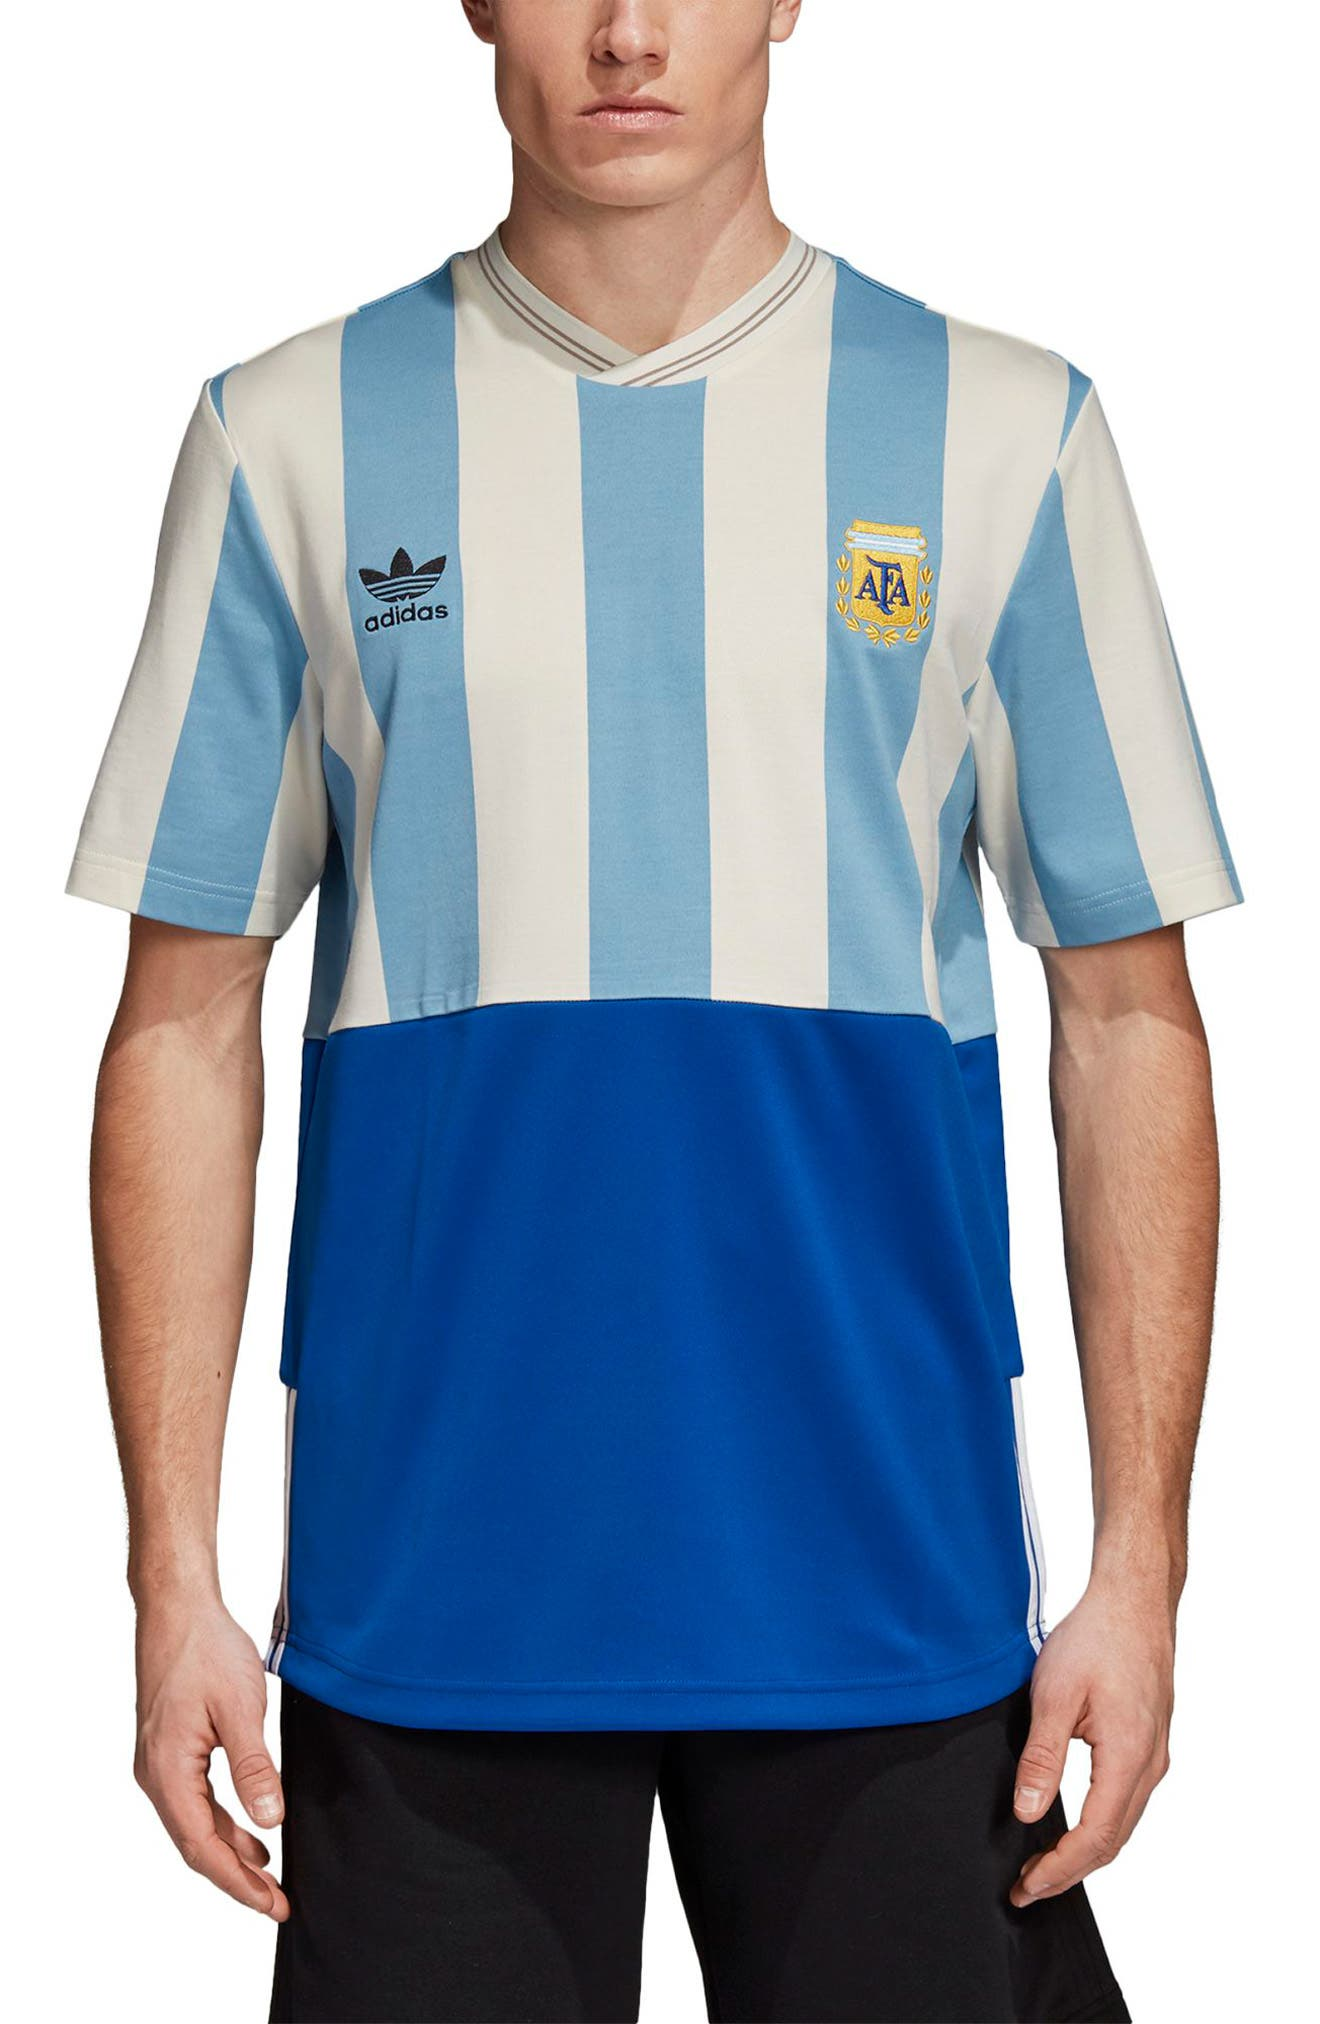 Argentina Mash-Up Jersey,                             Main thumbnail 1, color,                             Shade Blue/ Echo Whit